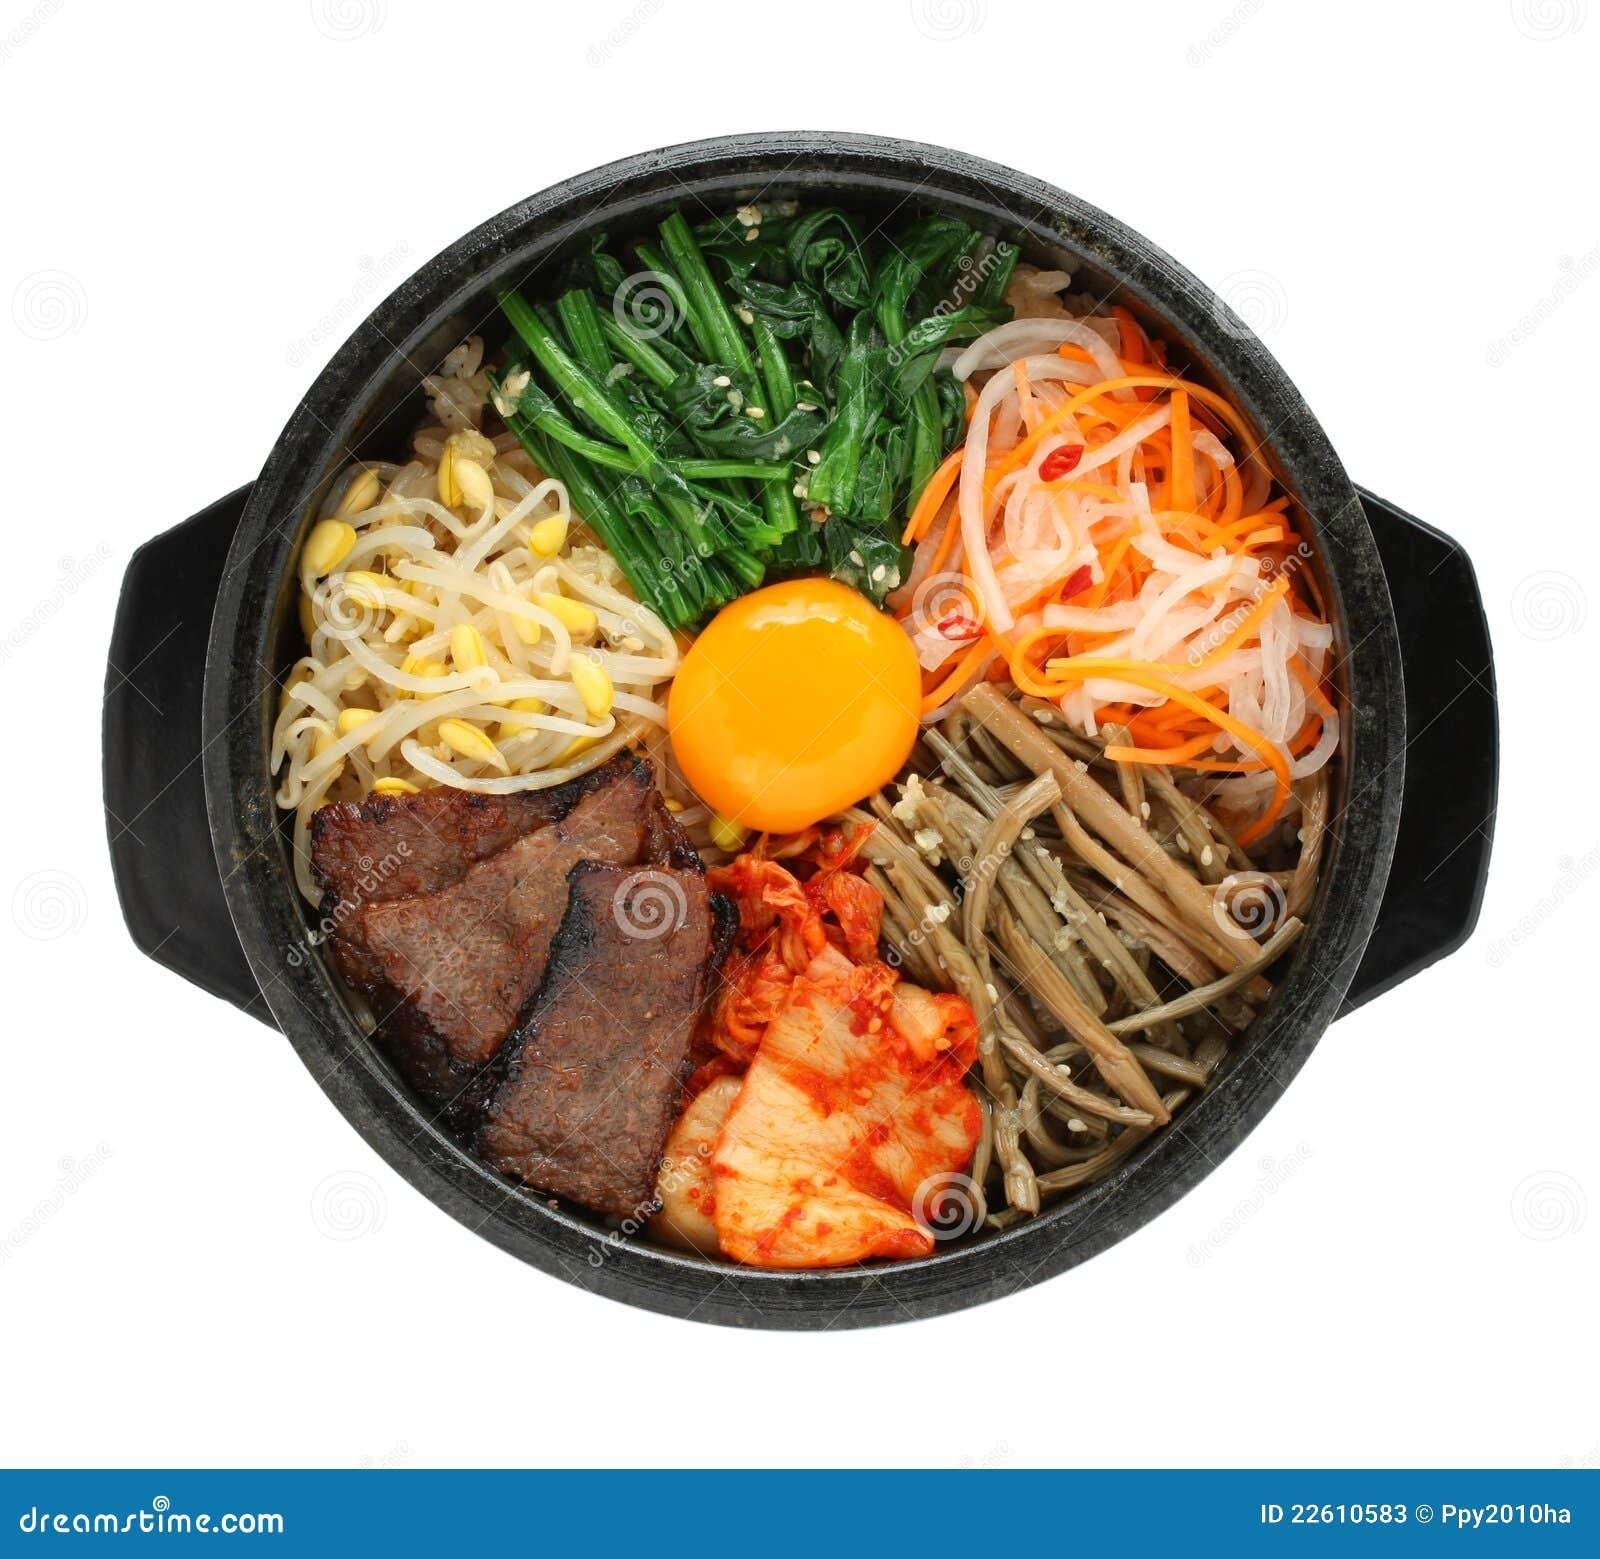 bibimbap, koreanische küche stockfotos - bild: 22610583